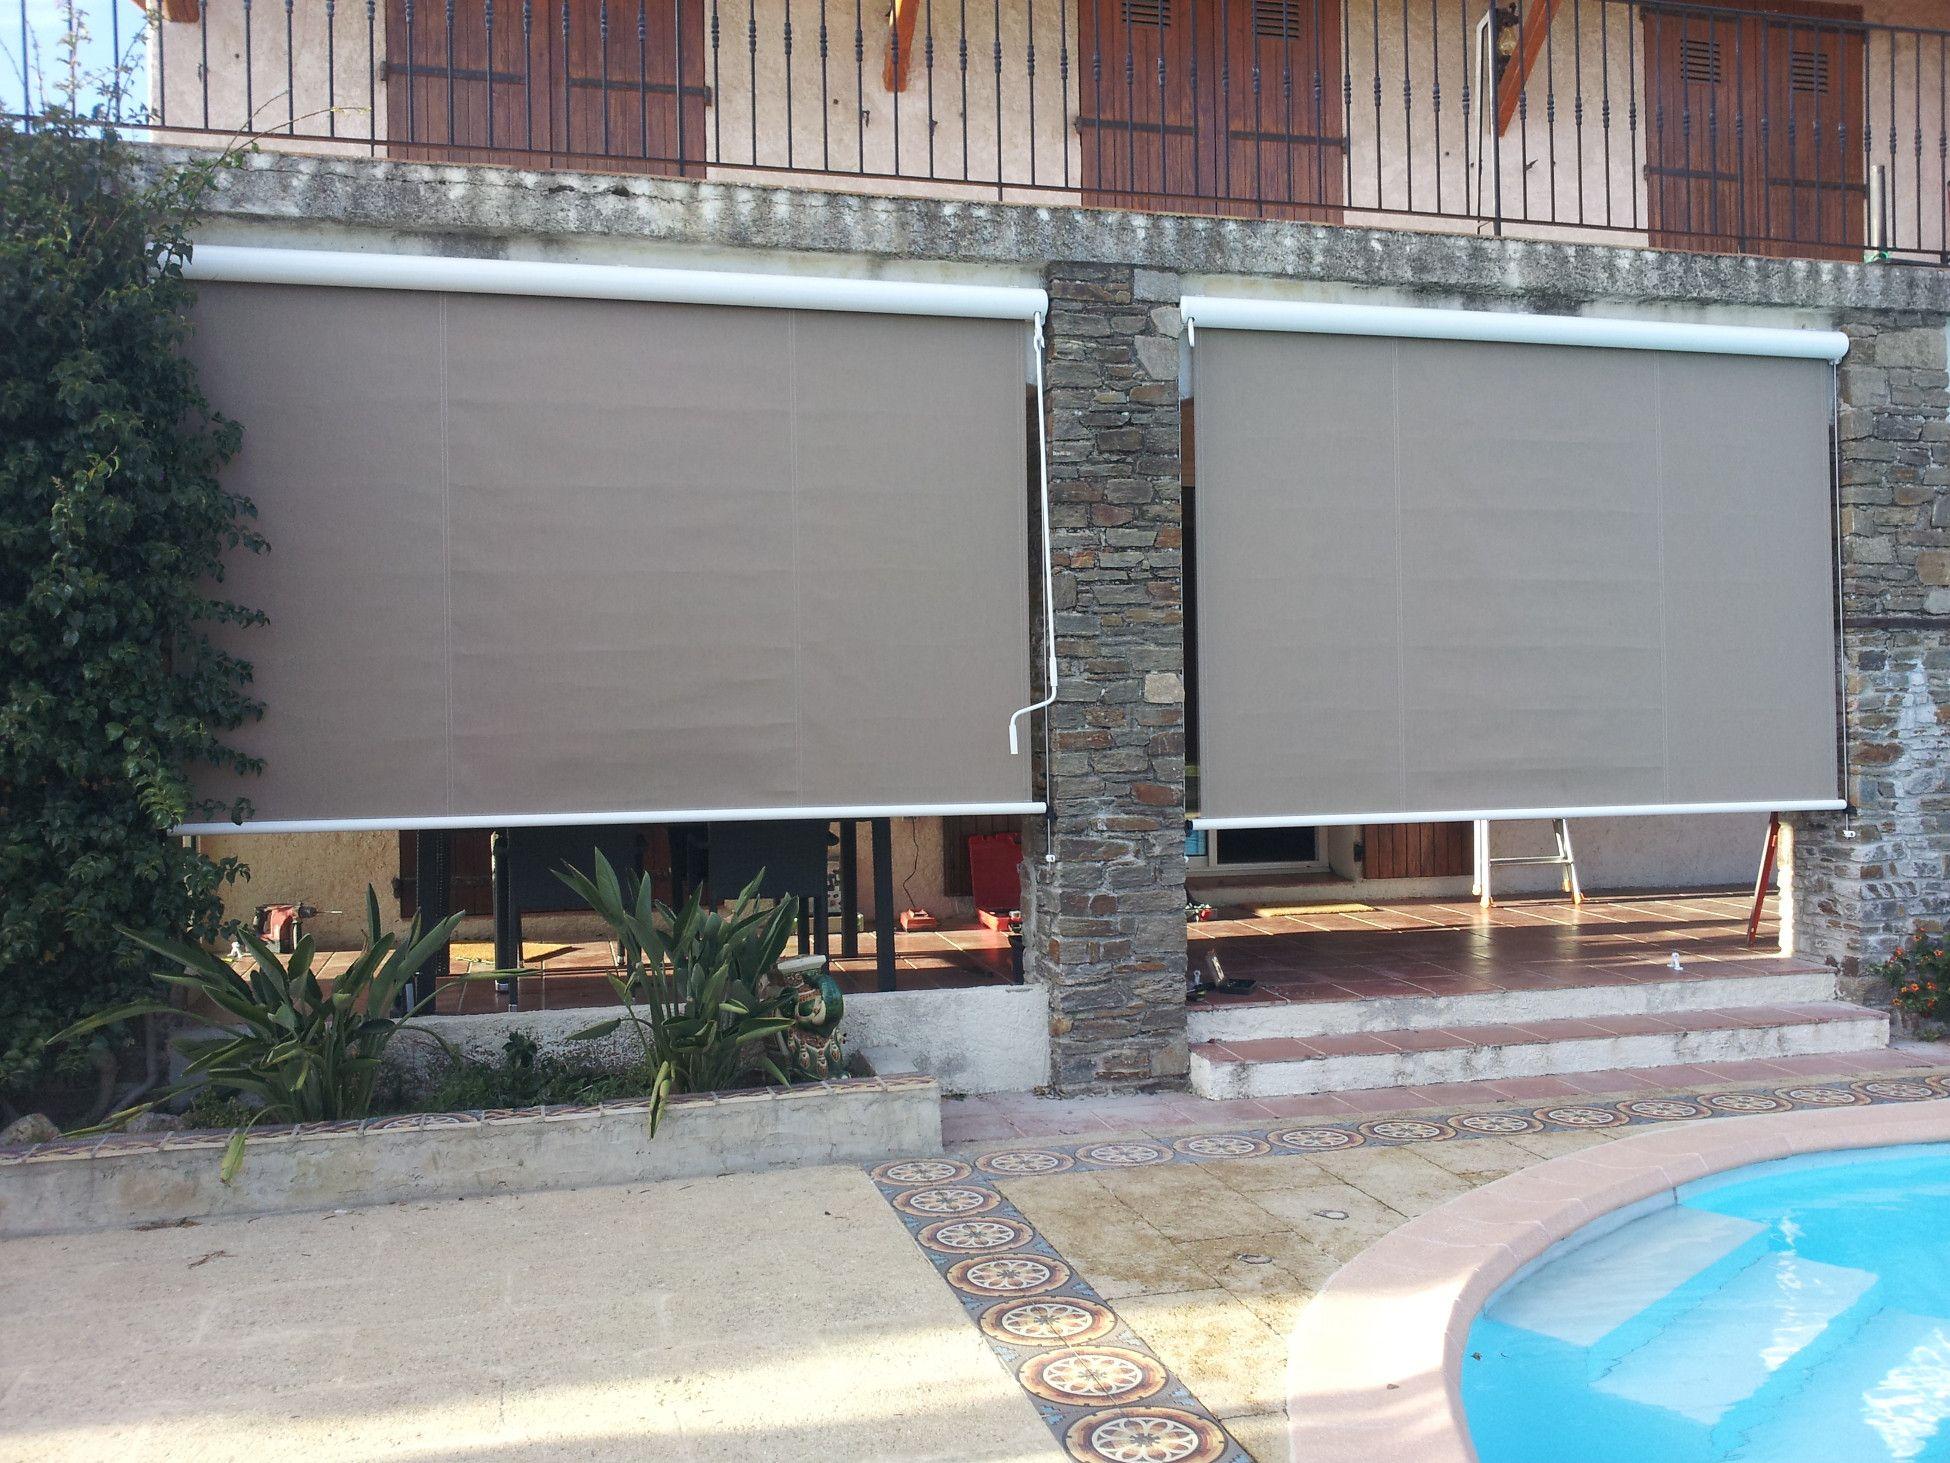 New Stores Bannes Castorama Outdoor Decor Outdoor Vertical